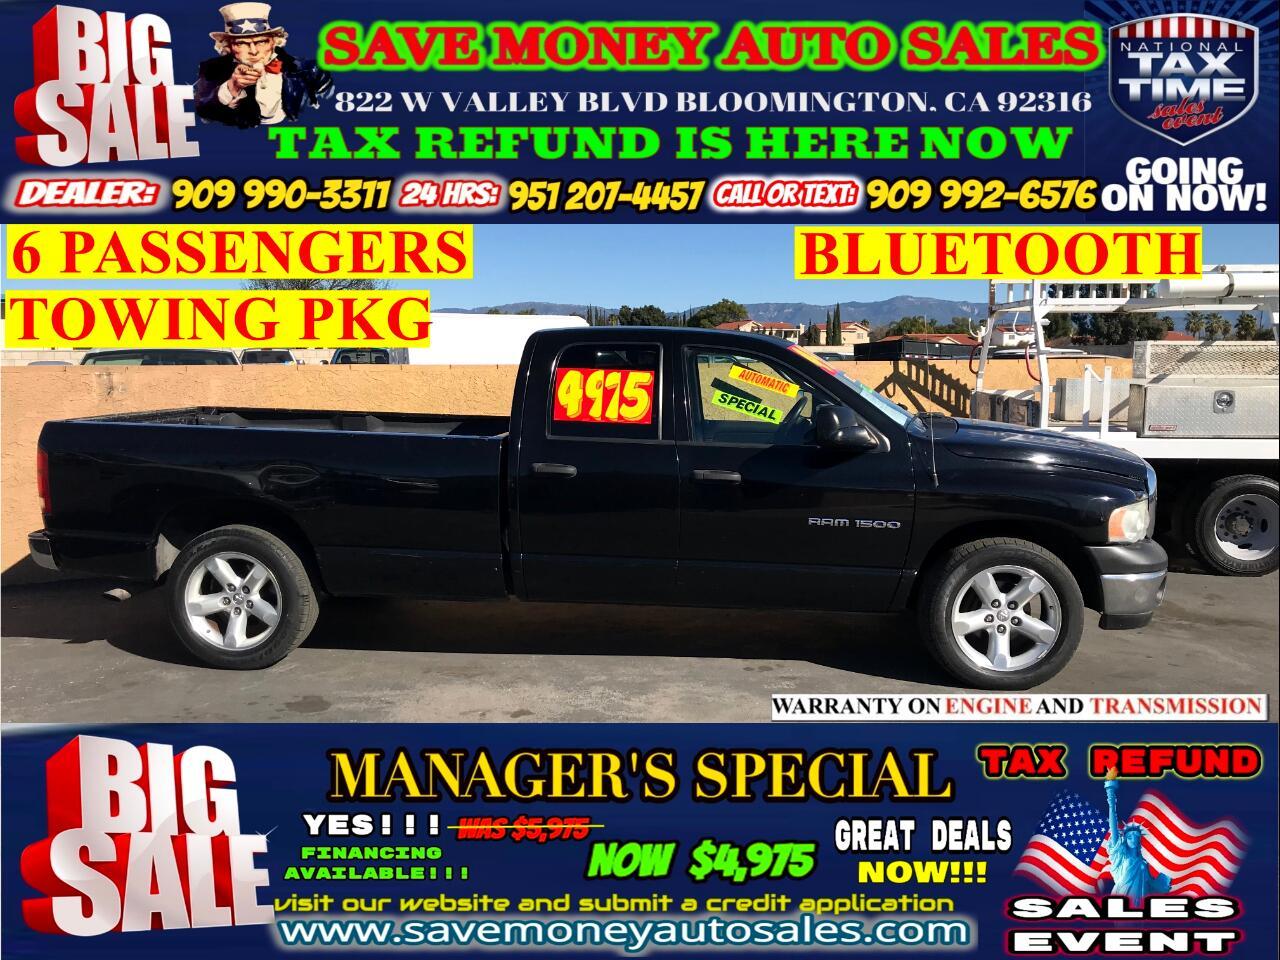 2004 Dodge Ram 1500 SLT QUAD CAB>TOW PACKAGE,6 PASSRNGERS+BLUETOOTH>>